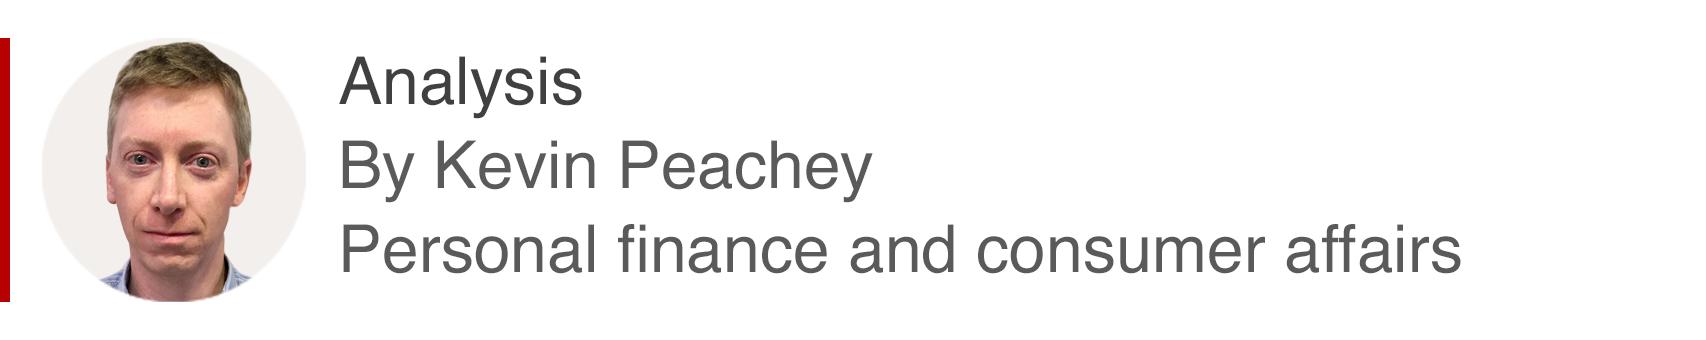 Kevin Peachey